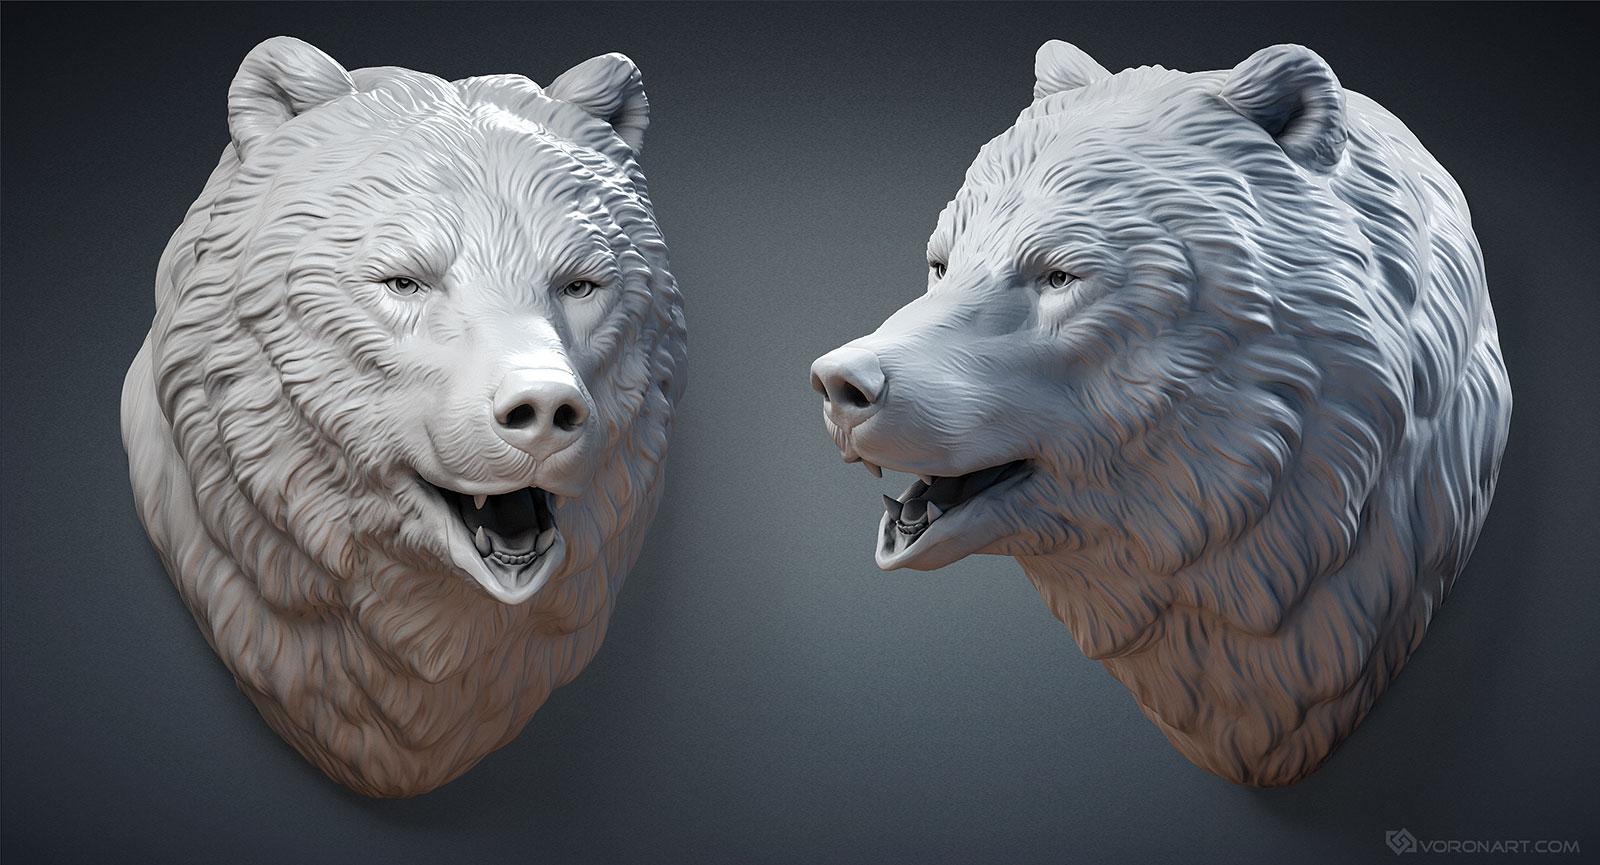 Bear Head Sculpture Wall Mount Model For 3d Printing Cnc